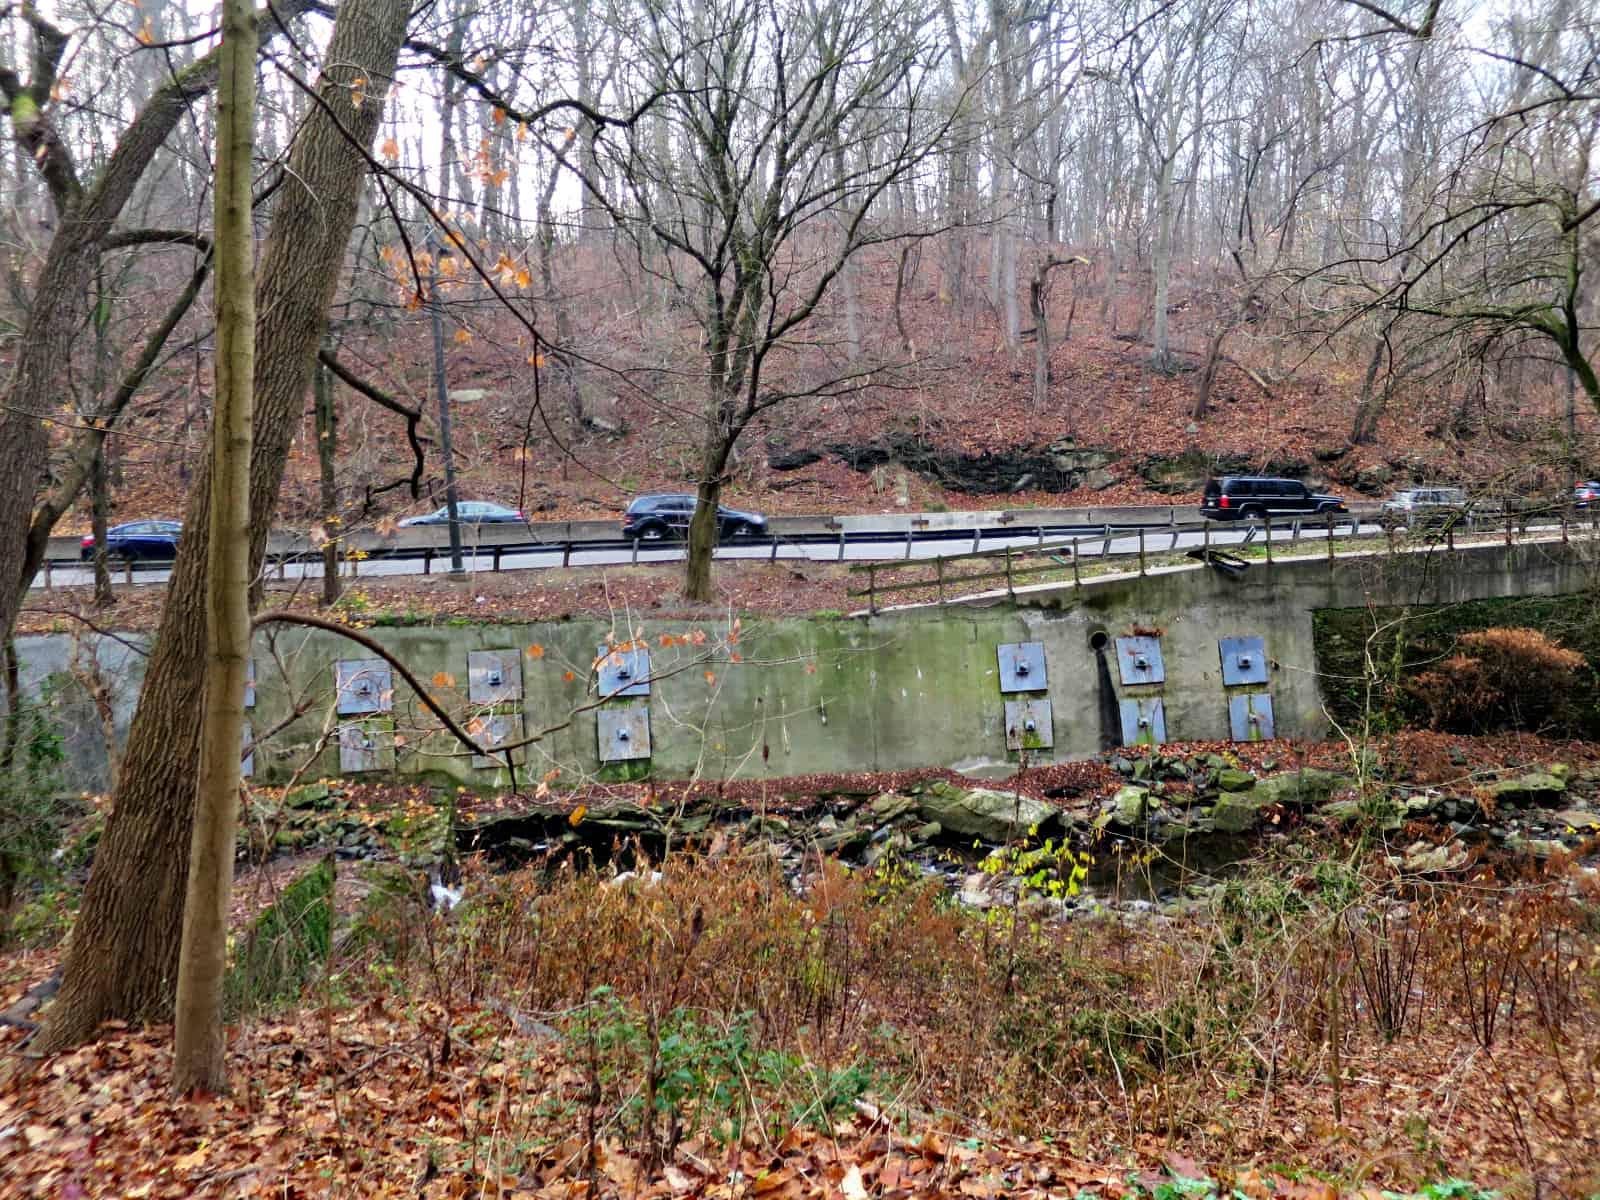 eastfallslocal-12-11-wissahickon-creek-lincoln-drive-kinda-scary-rivets-3-pm